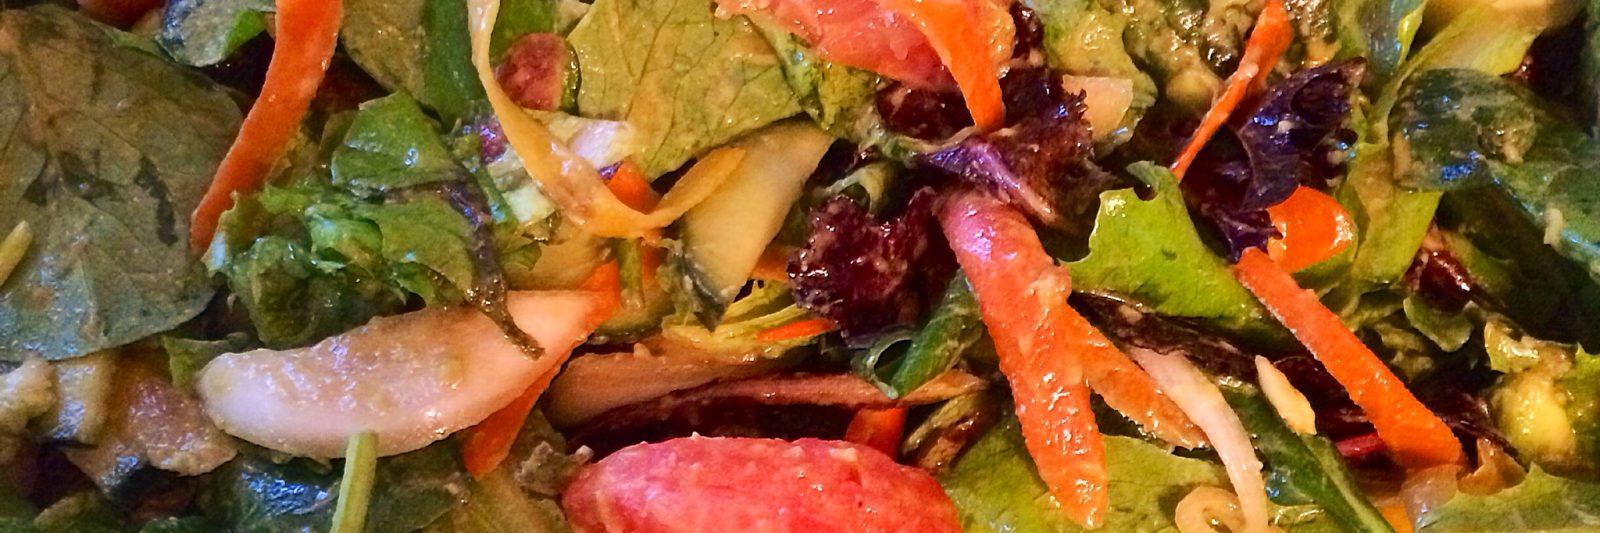 creamy-citrus-salad